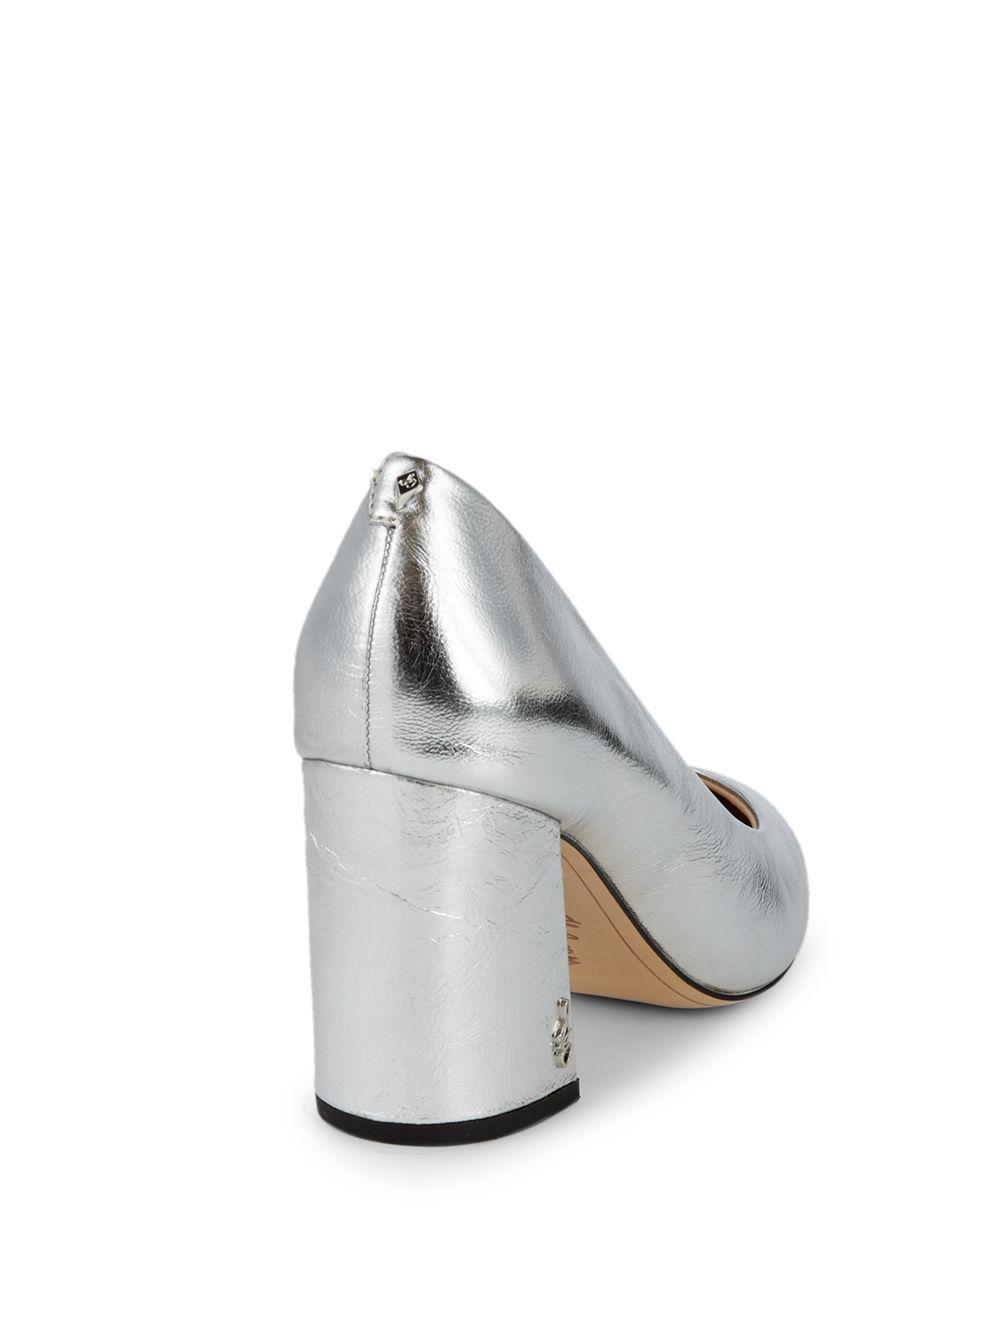 1043b670cfec1f Lyst - Sam Edelman Tatiana Metallic Leather Pointy Pumps in Metallic - Save  62%